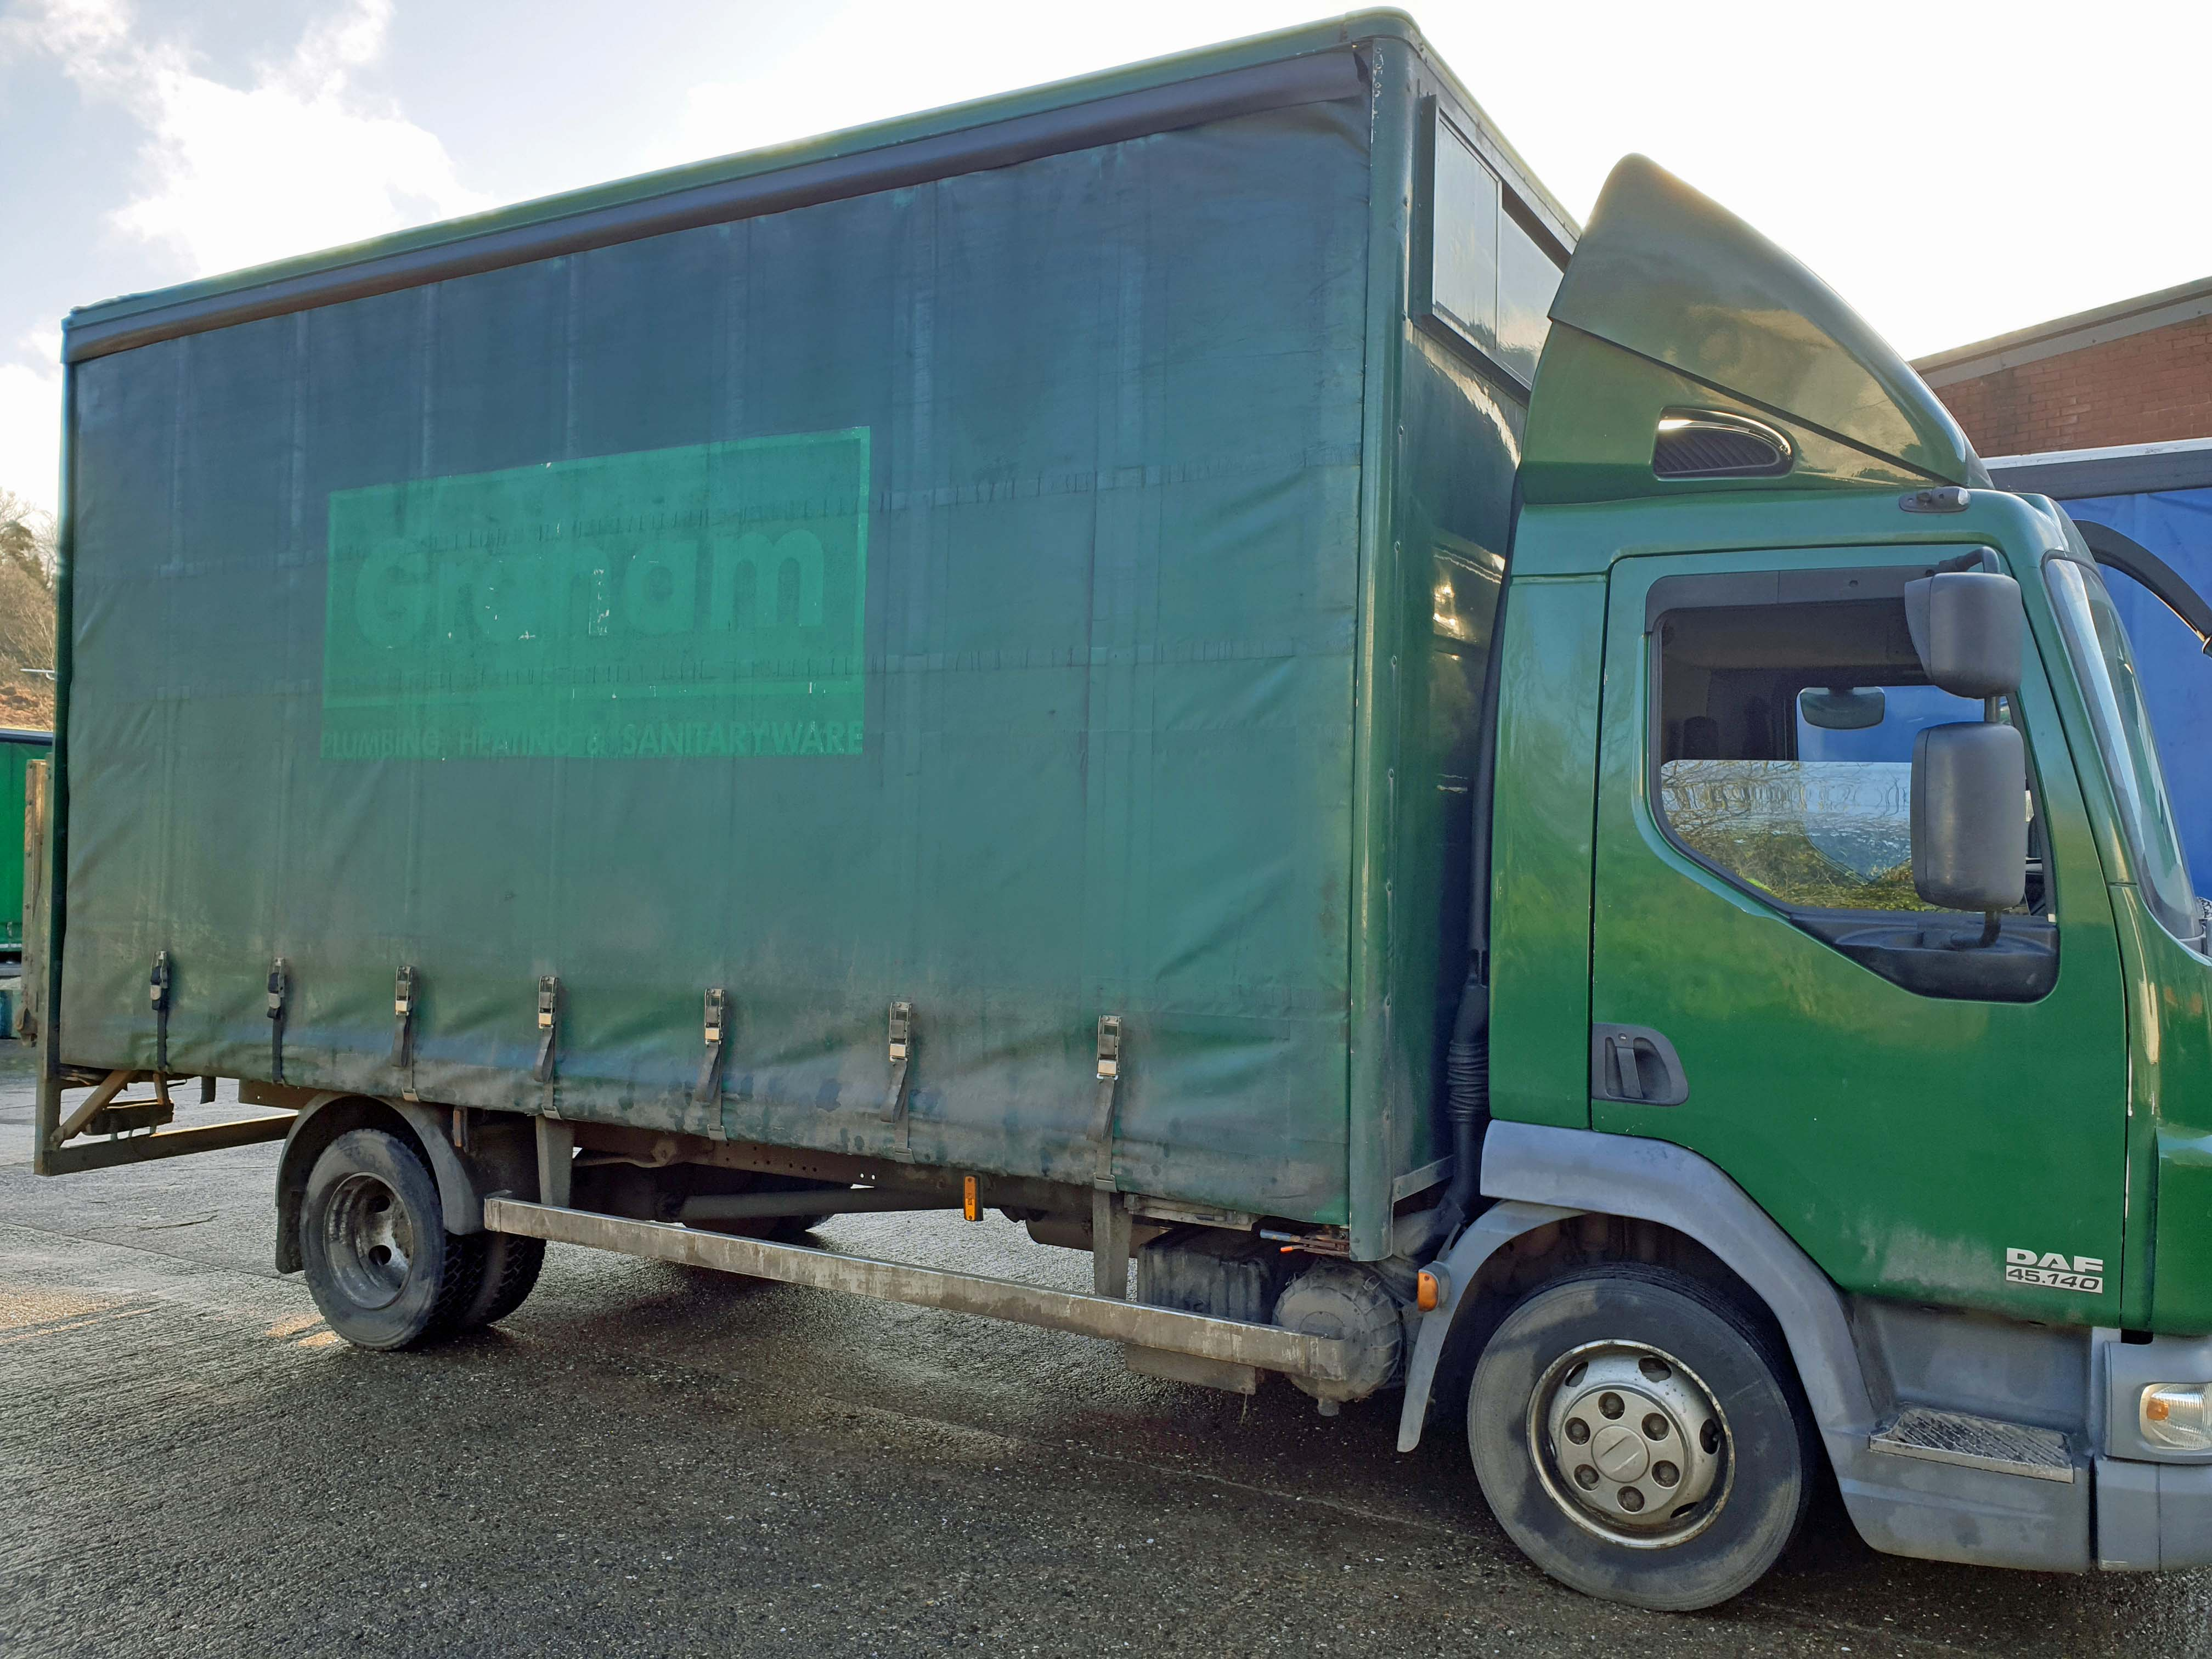 A DAF FA LF45.140 08 E 4461CC Euro4 4x2 7.5-Tonne Curtainside Truck, Registration No. RV59 FVA, - Image 2 of 11